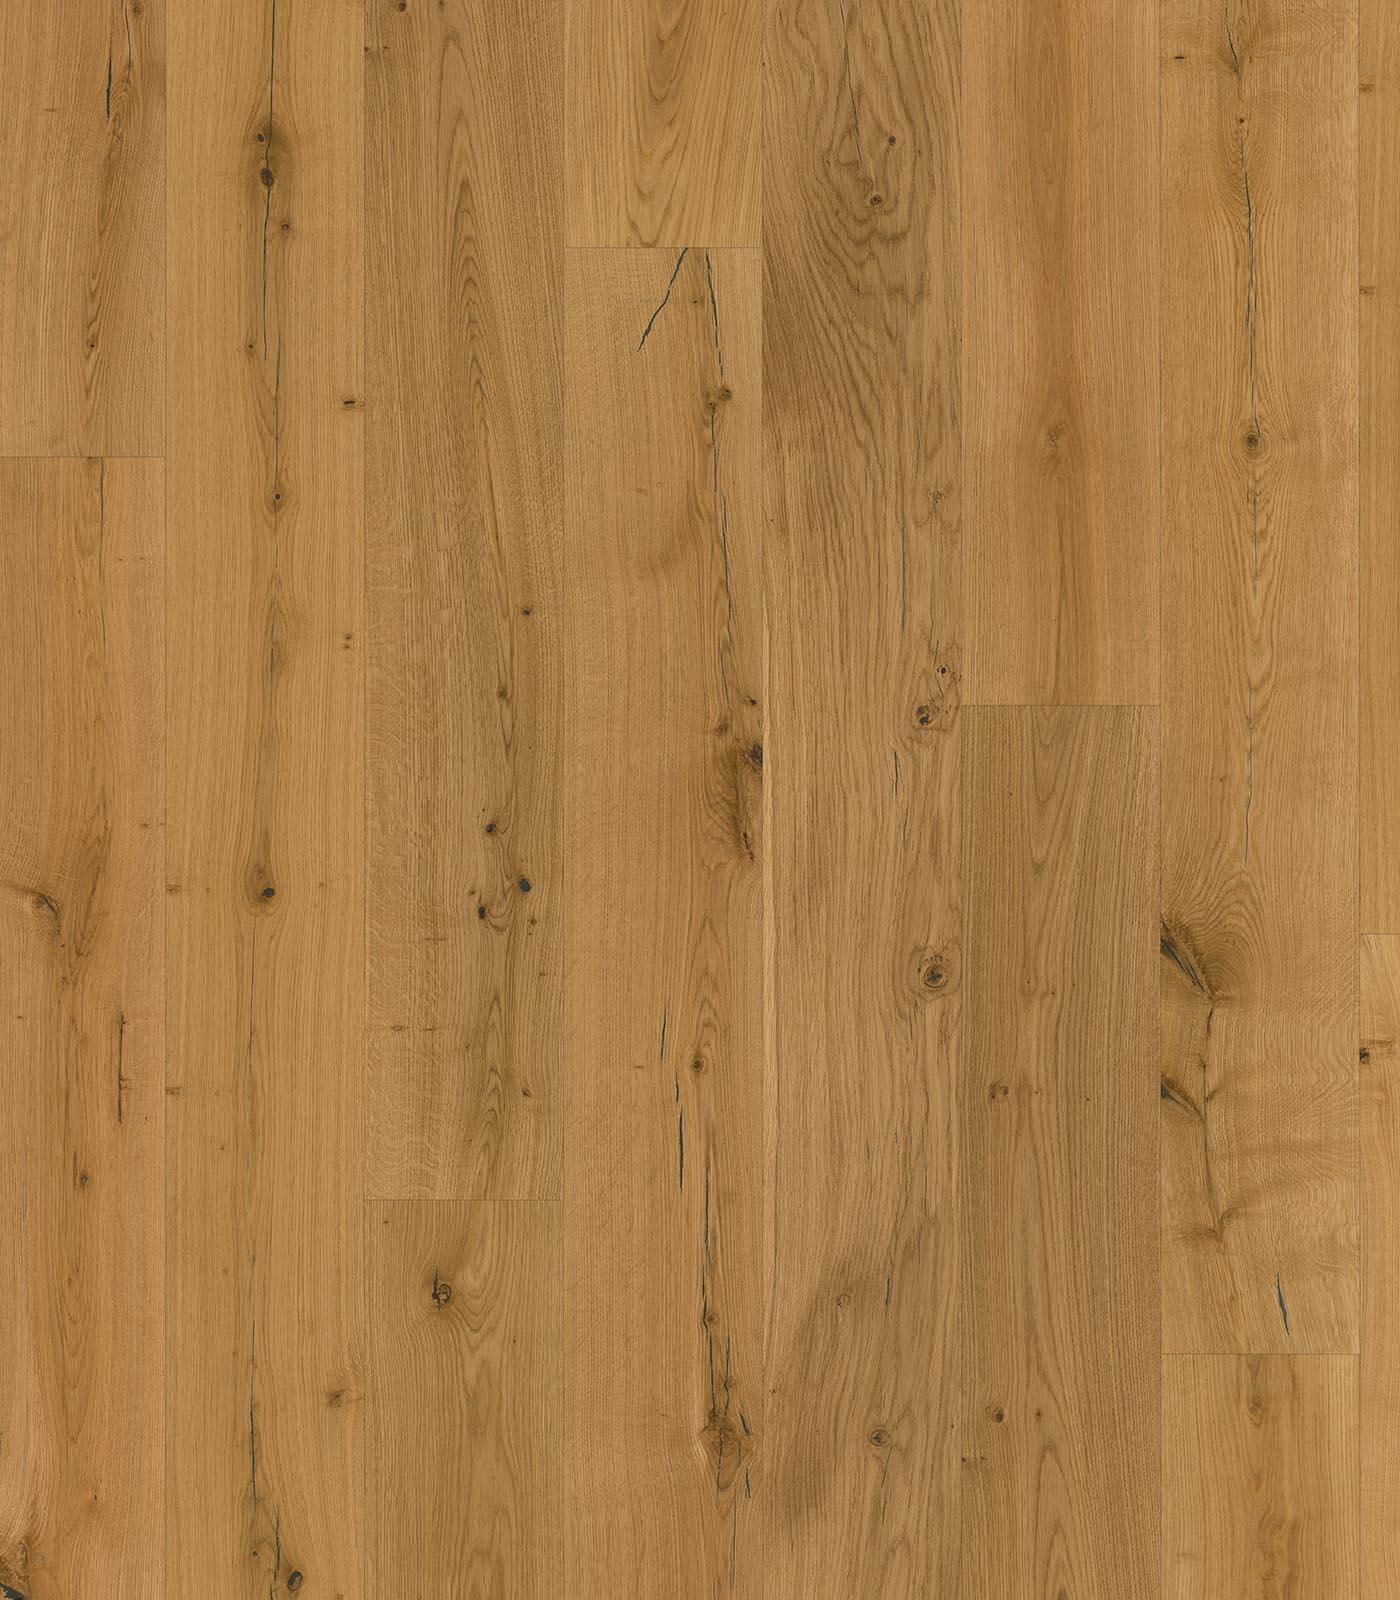 Oak Variante-European Oak floors-Variante Collection - Flat